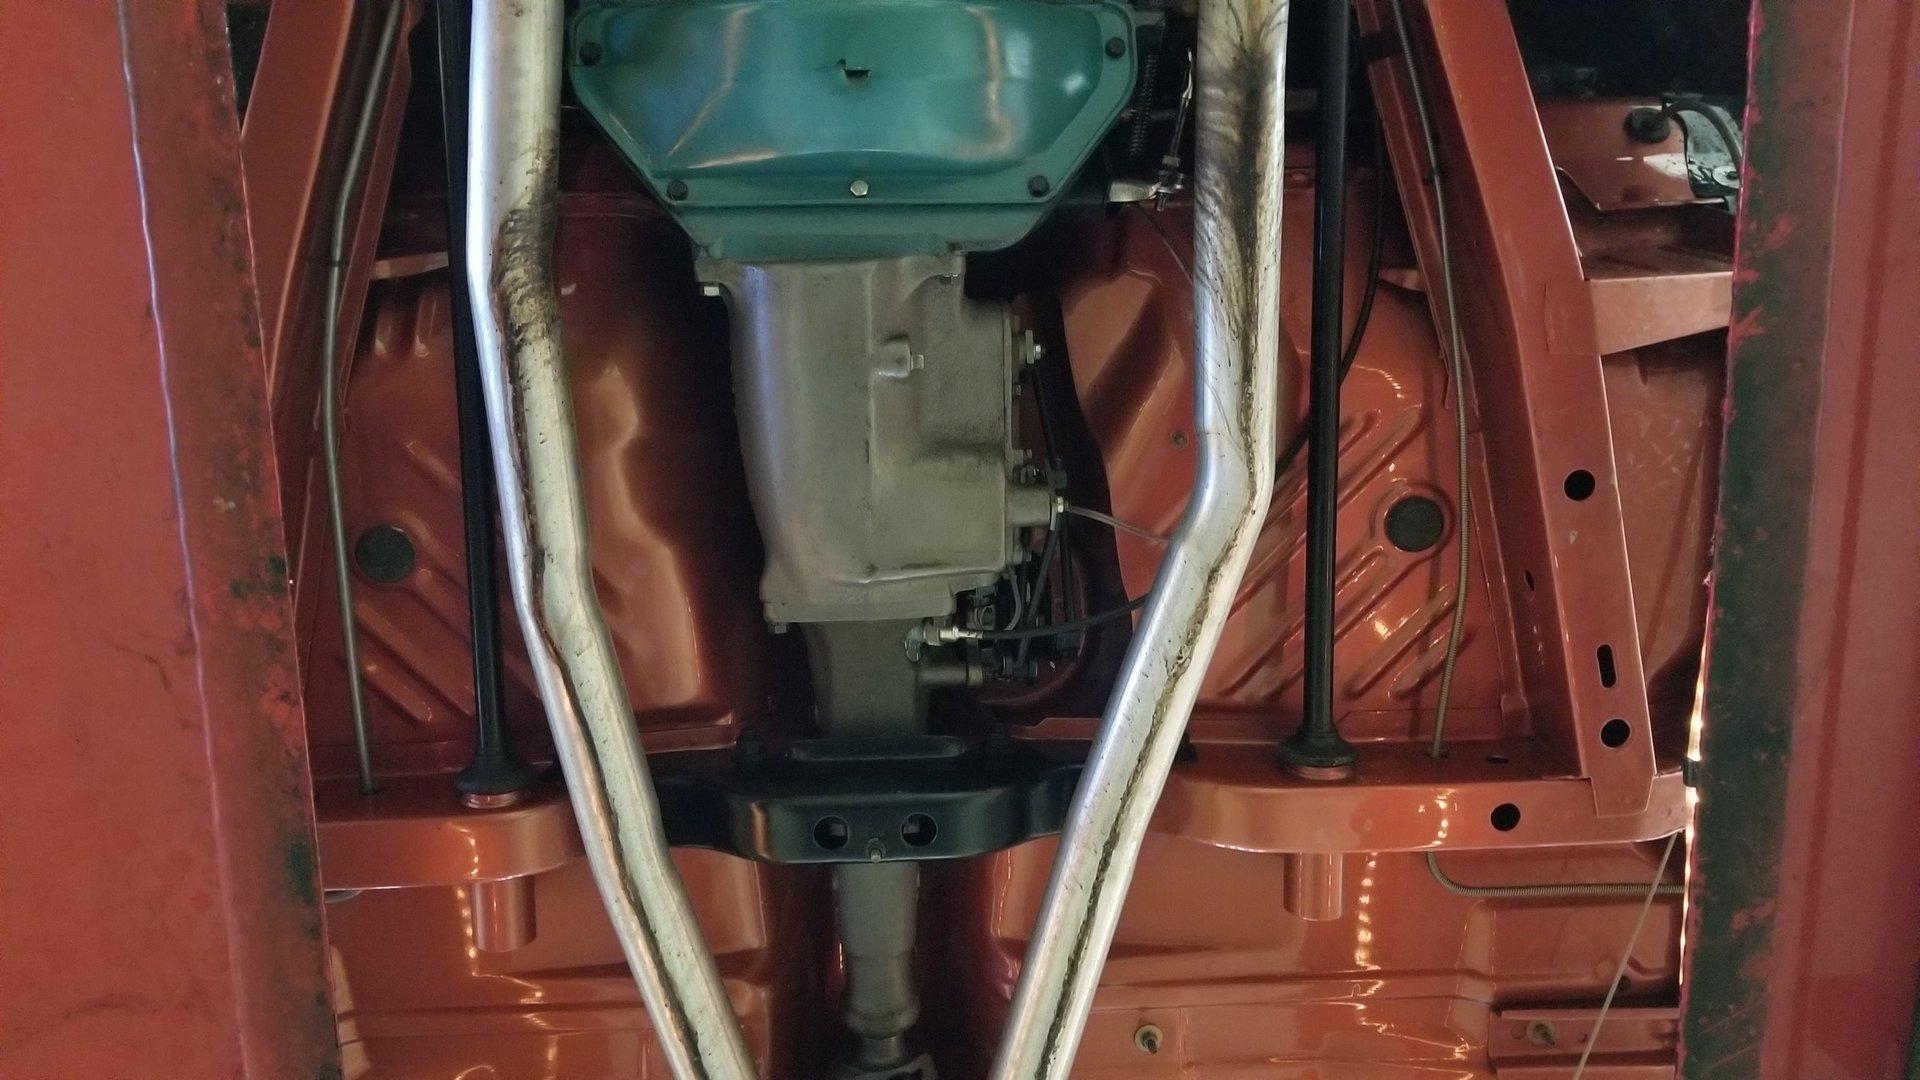 1967 Plymouth Belvedere Gtx For Sale 86940 Mcg Wiring Diagram